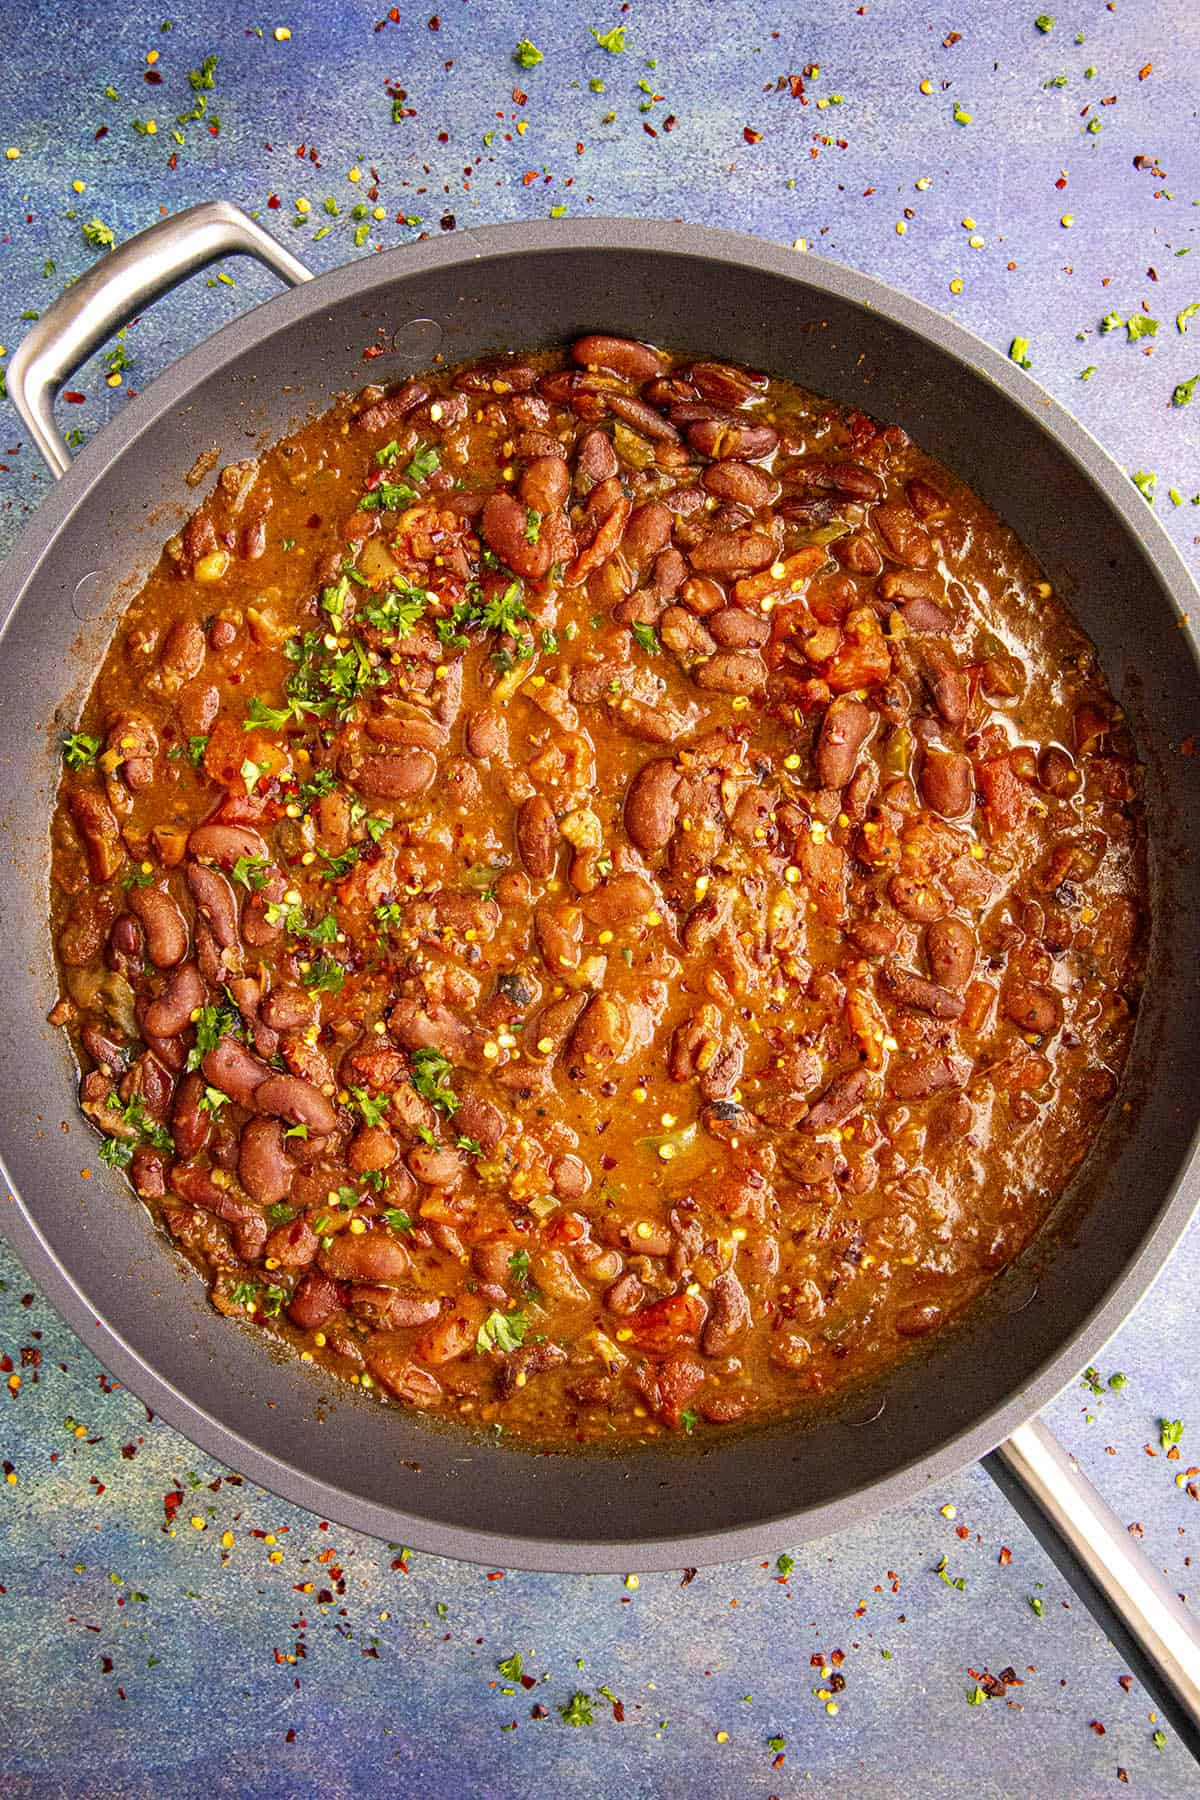 Hot Charro Beans in a pan